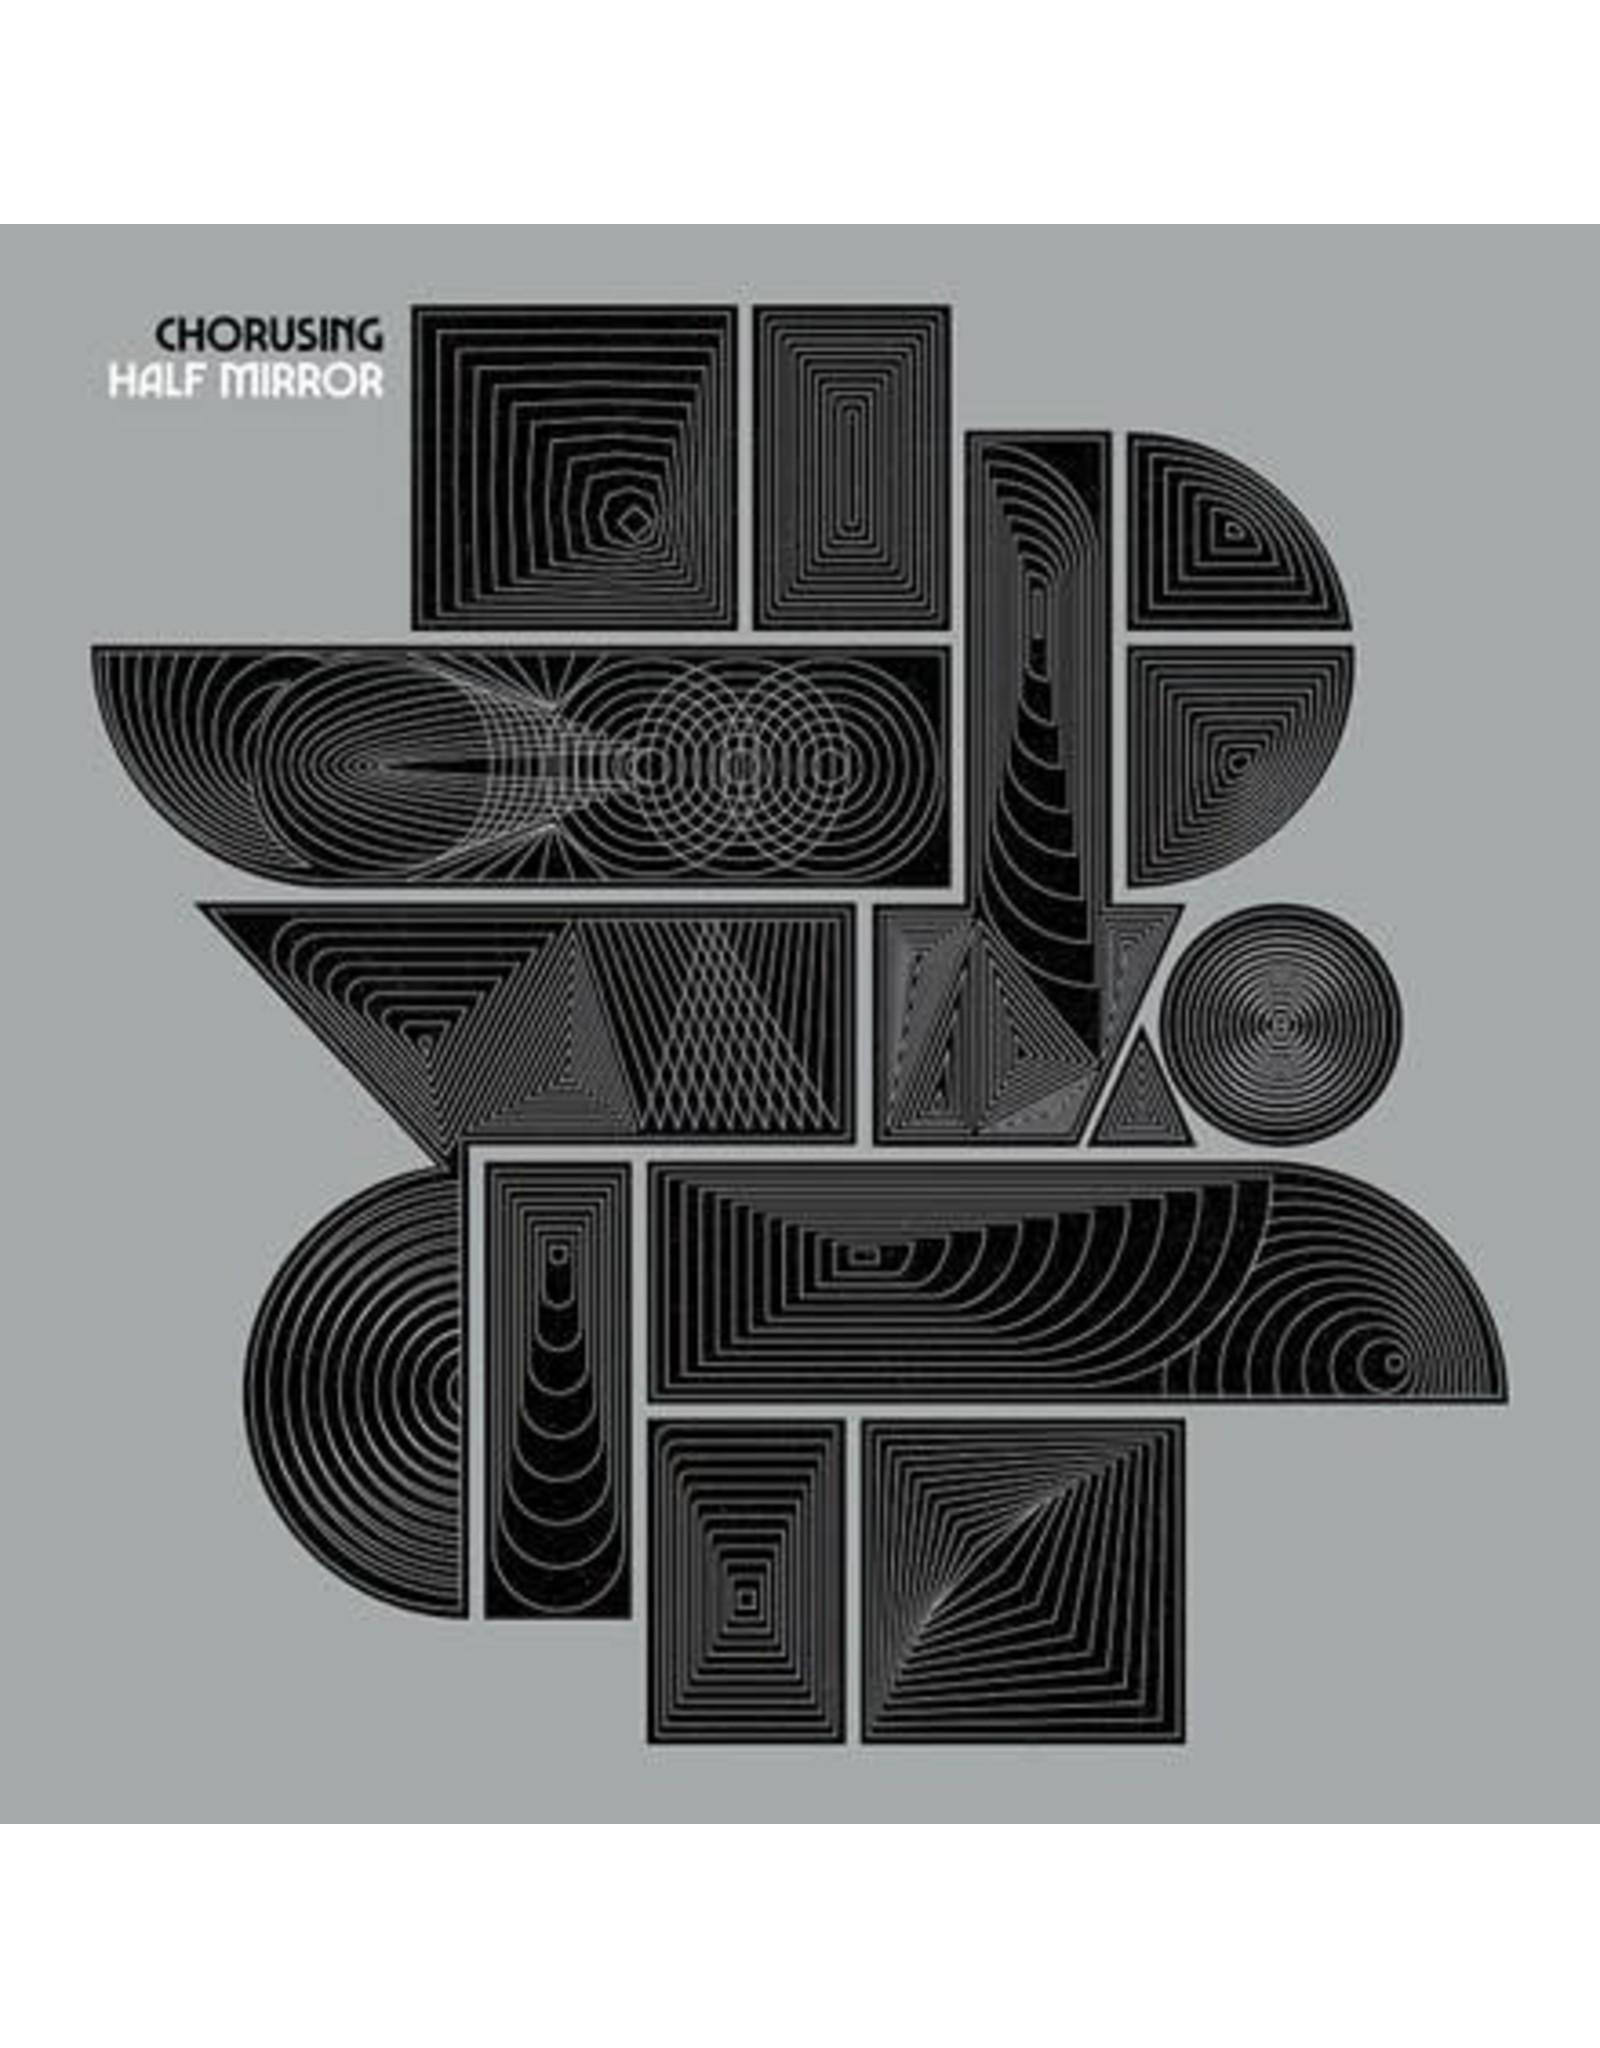 Western Vinyl Chorusing: Half Mirror LP